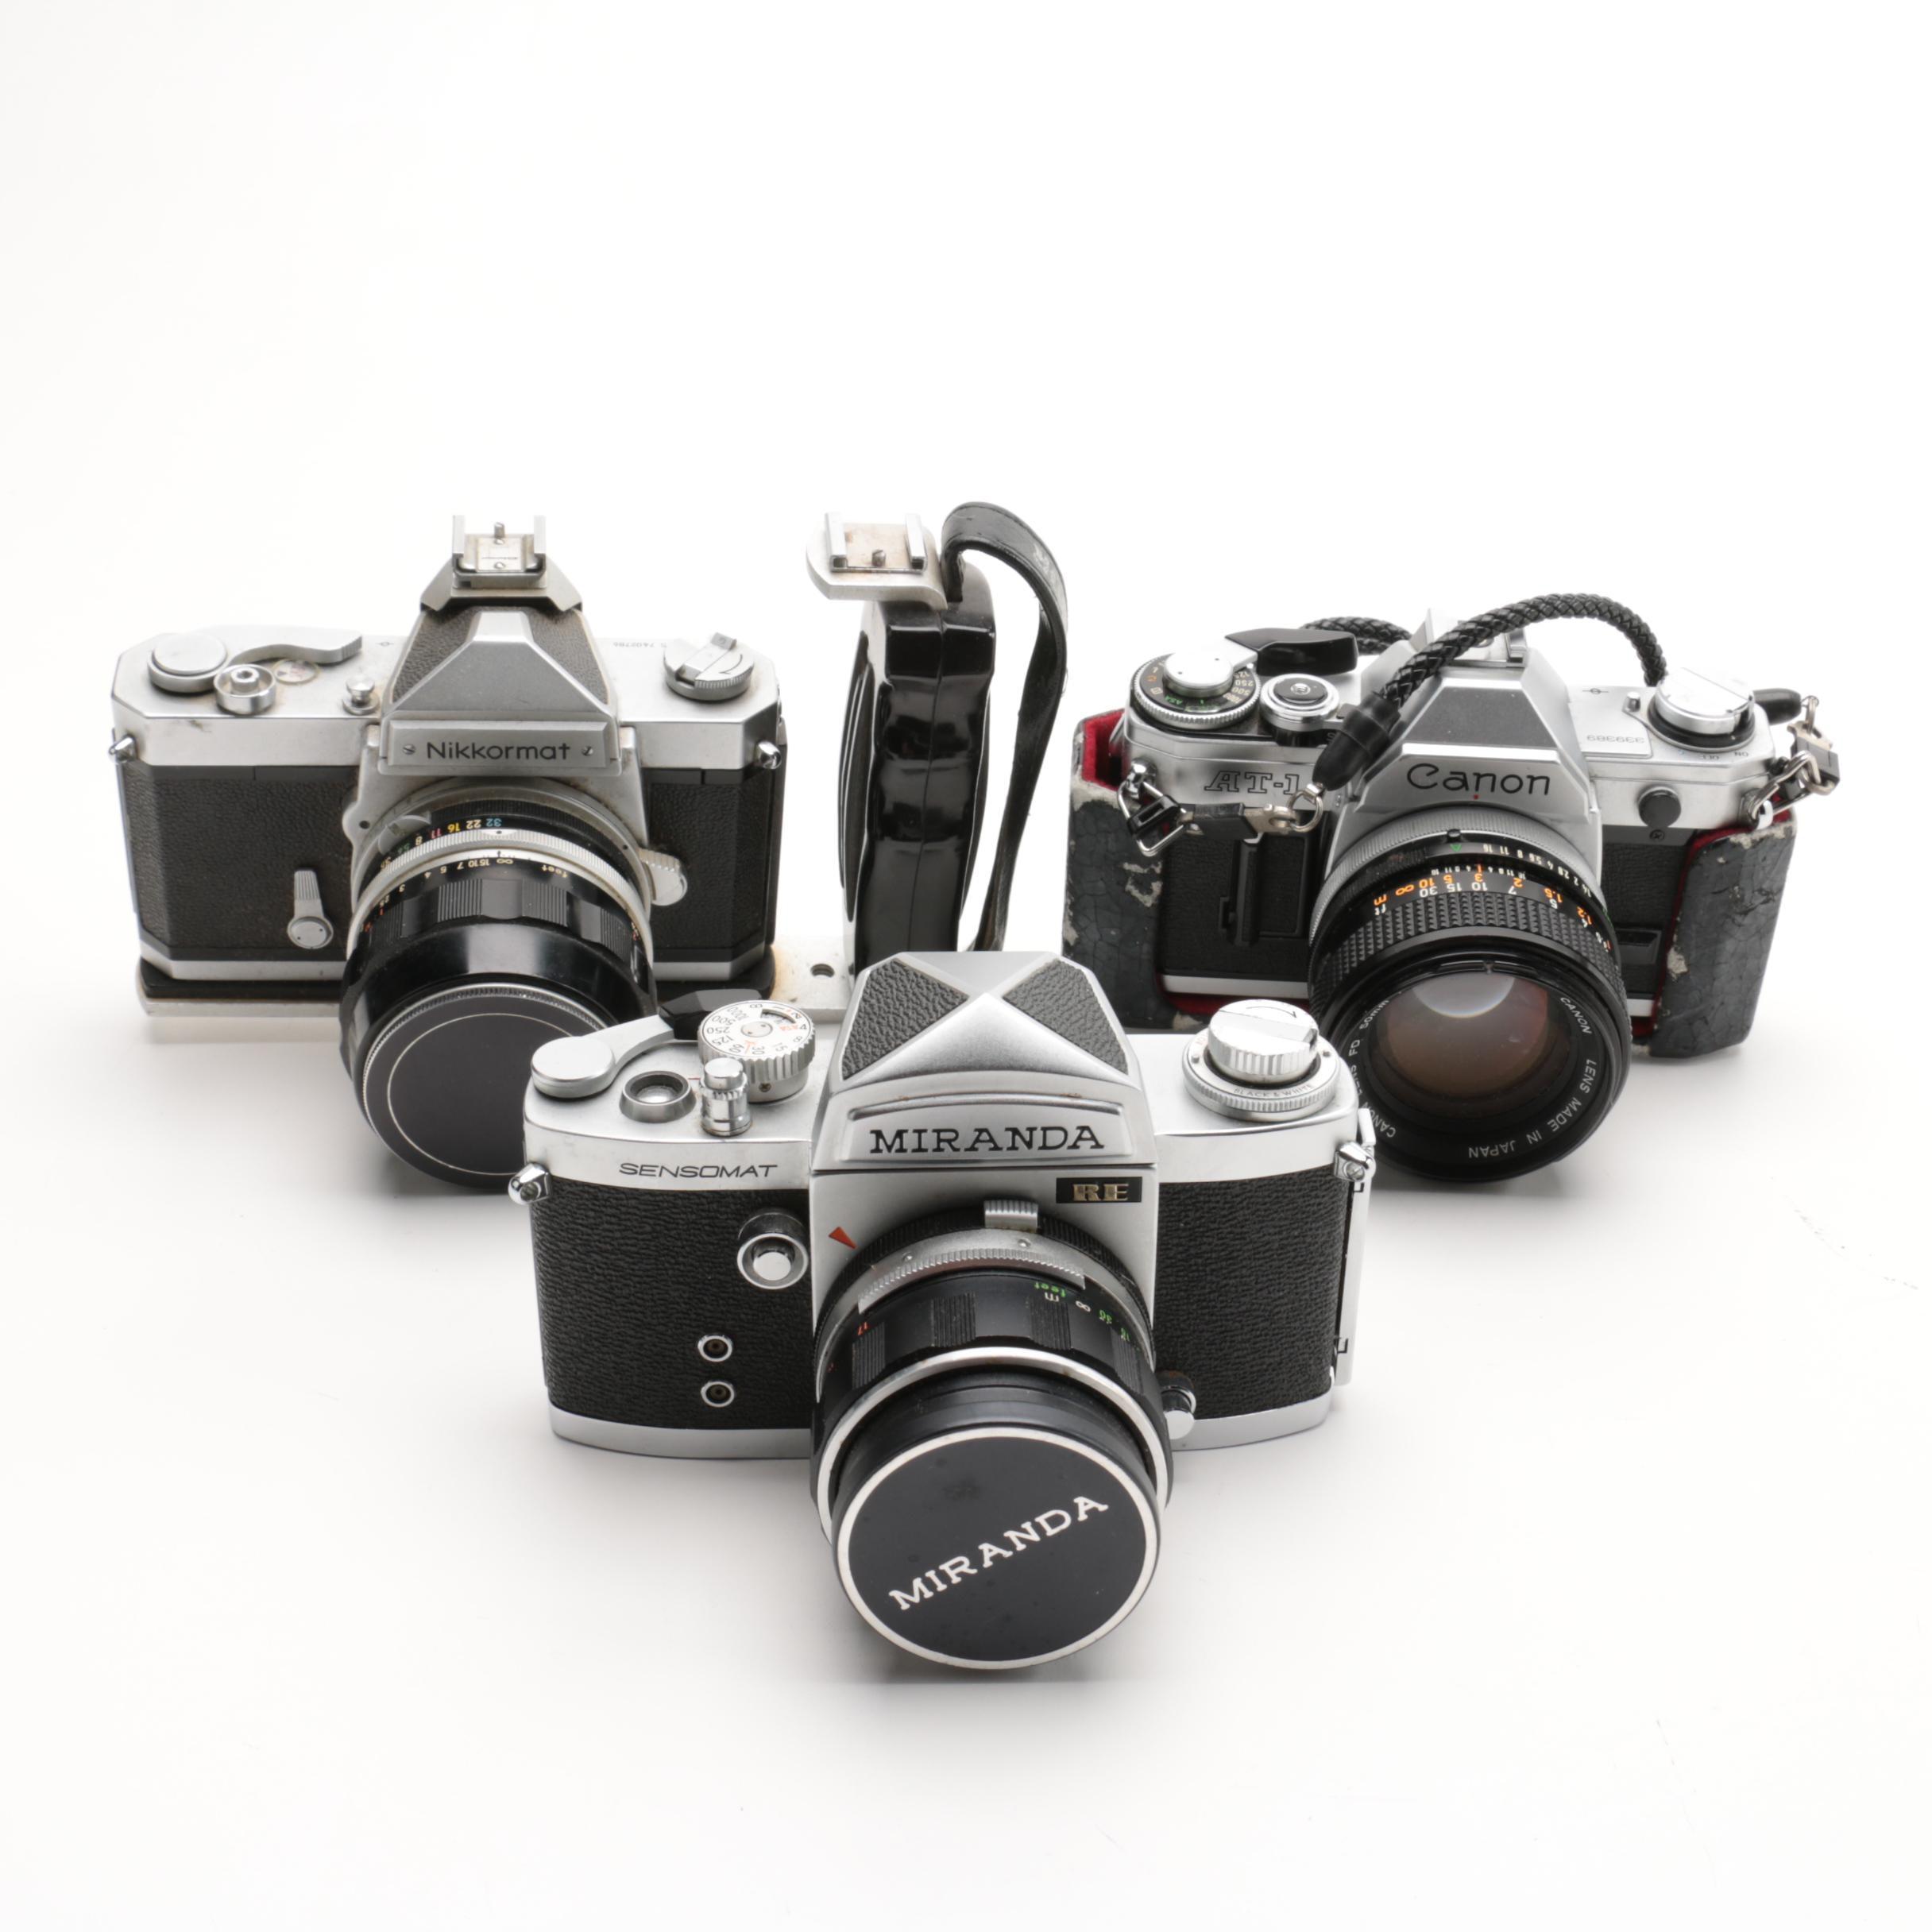 Nikkormat, Canon and Miranda Cameras